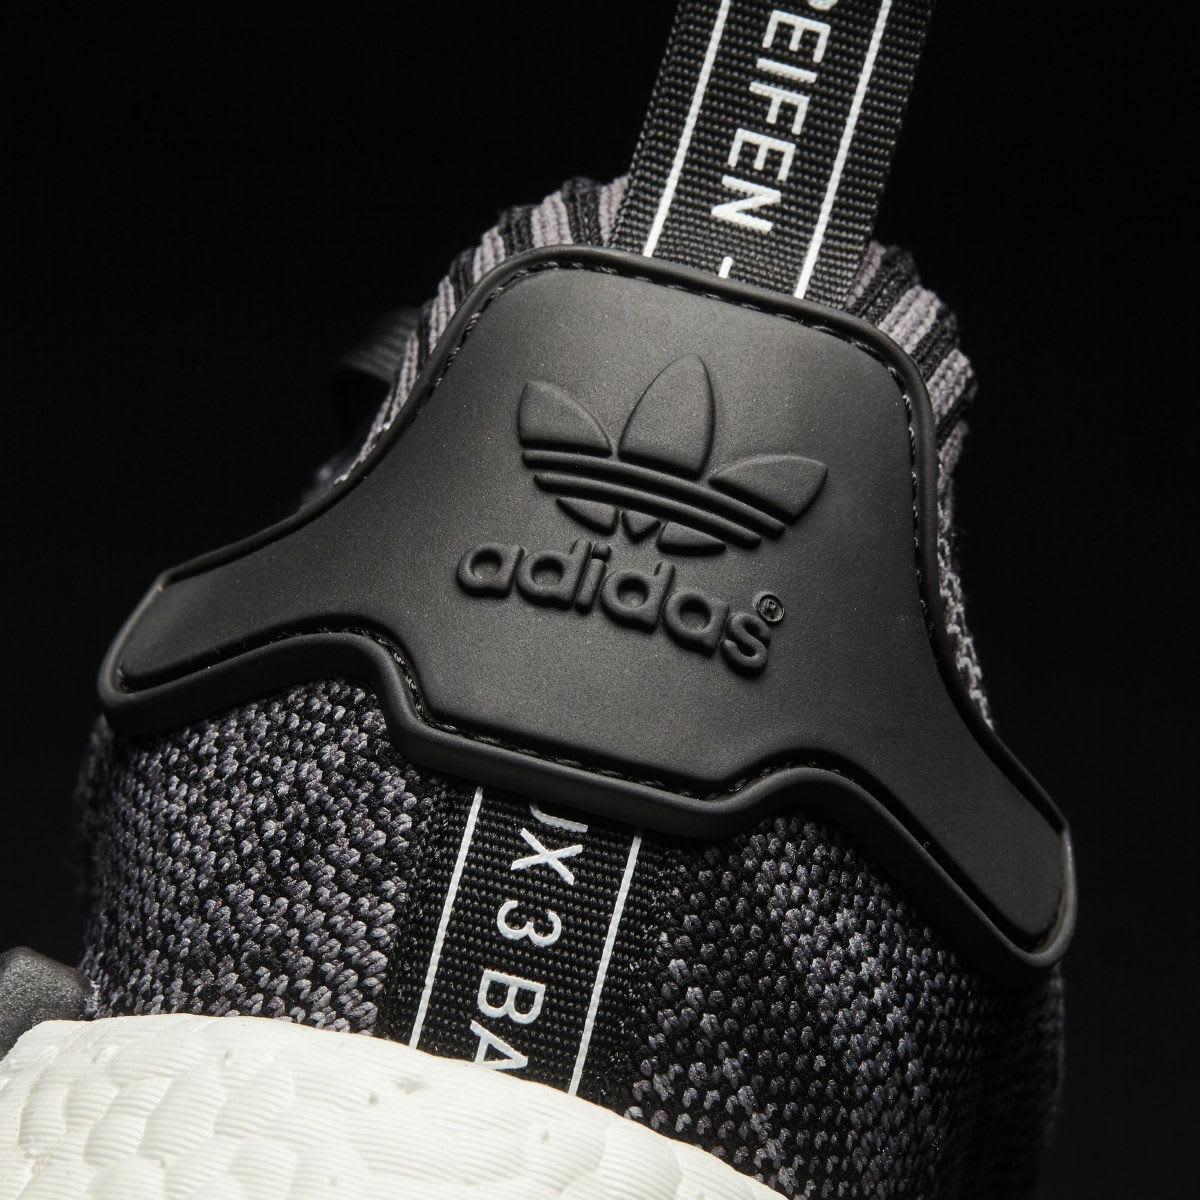 Adidas NMD R1 Primeknit Core Black White Heel CQ1863